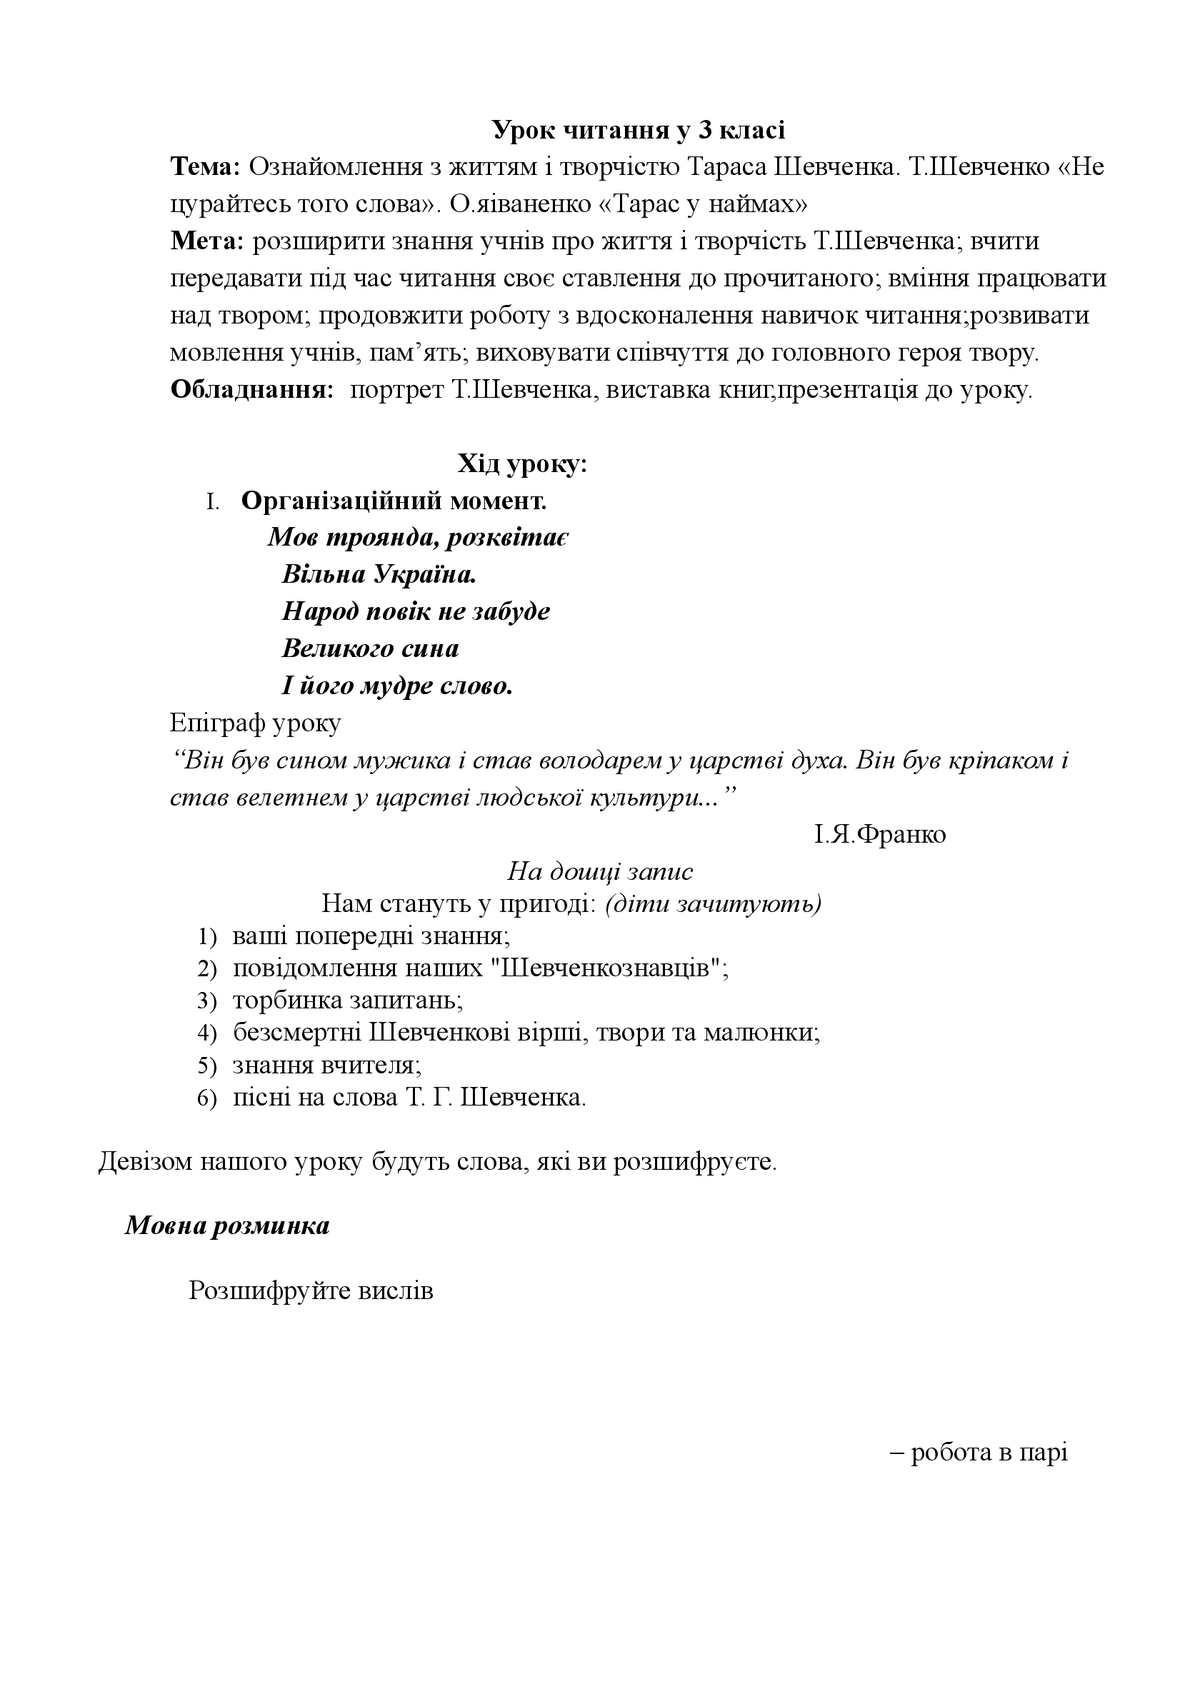 Урок читання у 3 класі вчитель Касьяненко В.В.